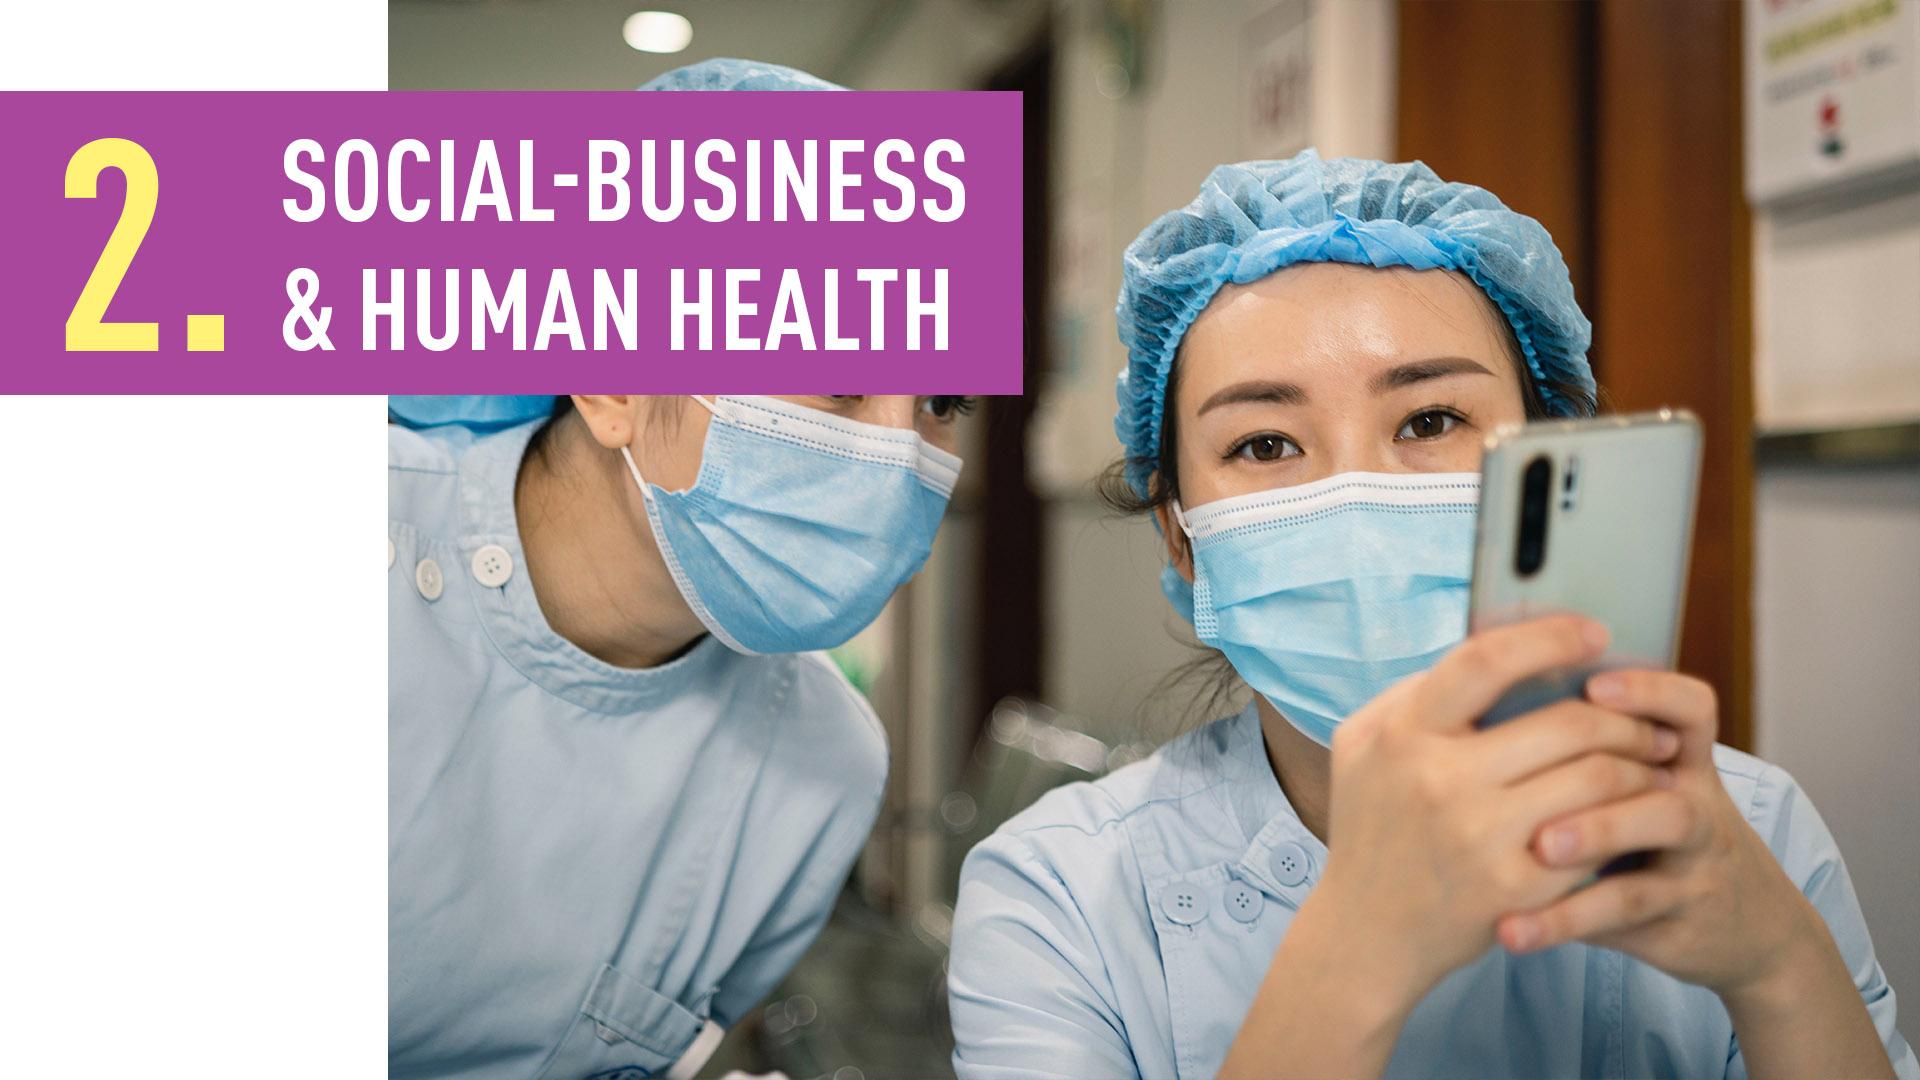 SOCIAL-BUSINESS & HUMAN HEALTH